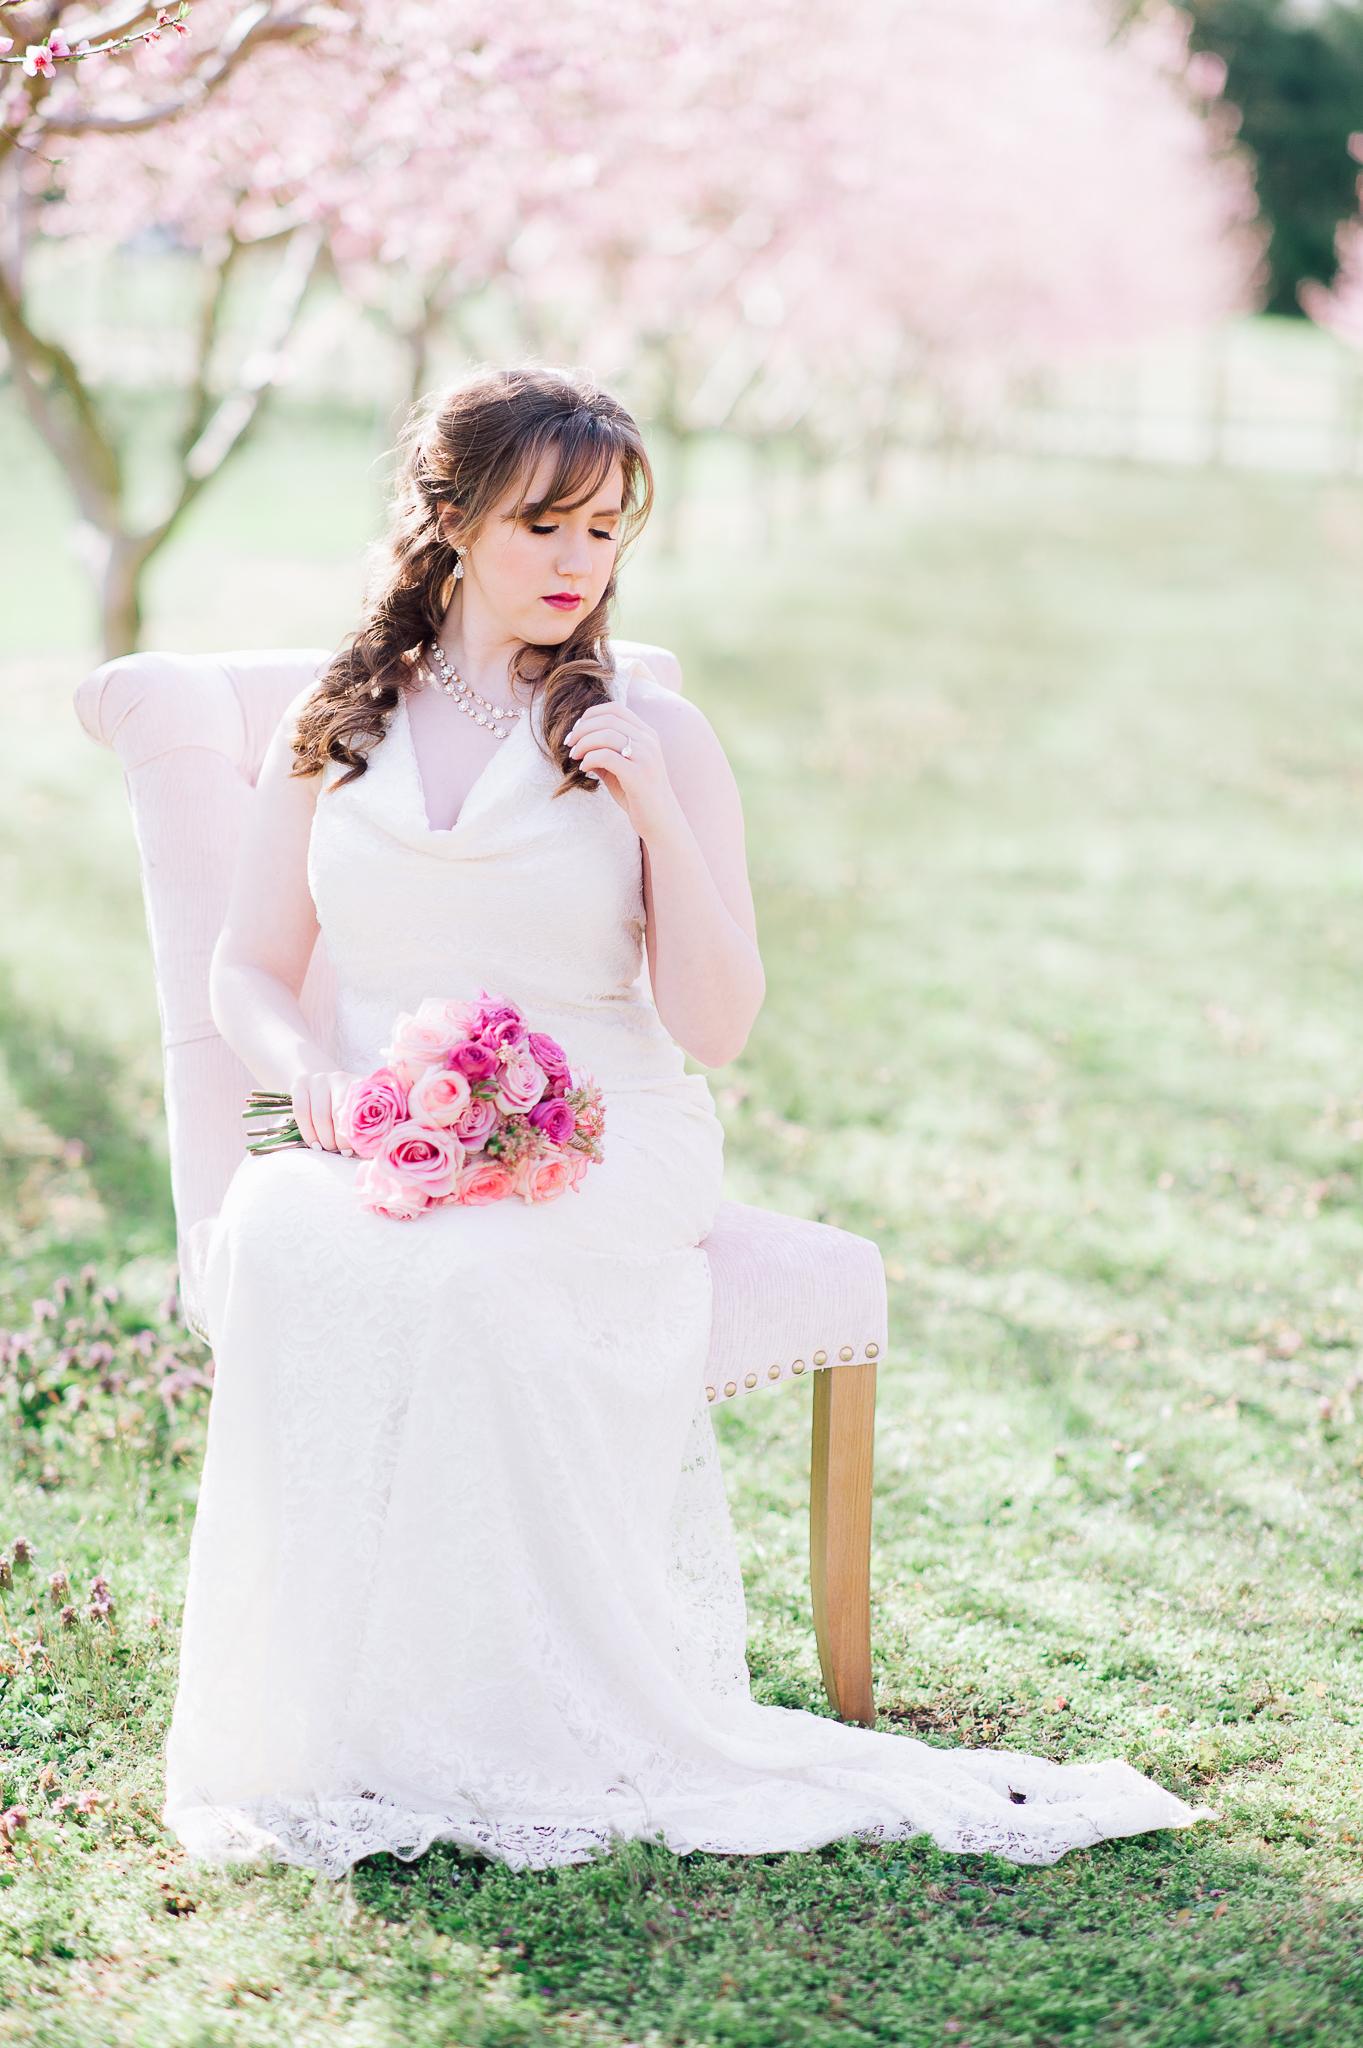 springwedding_cherryblossoms_virginiaphotographer_youseephotography_styledshoot (501).jpg